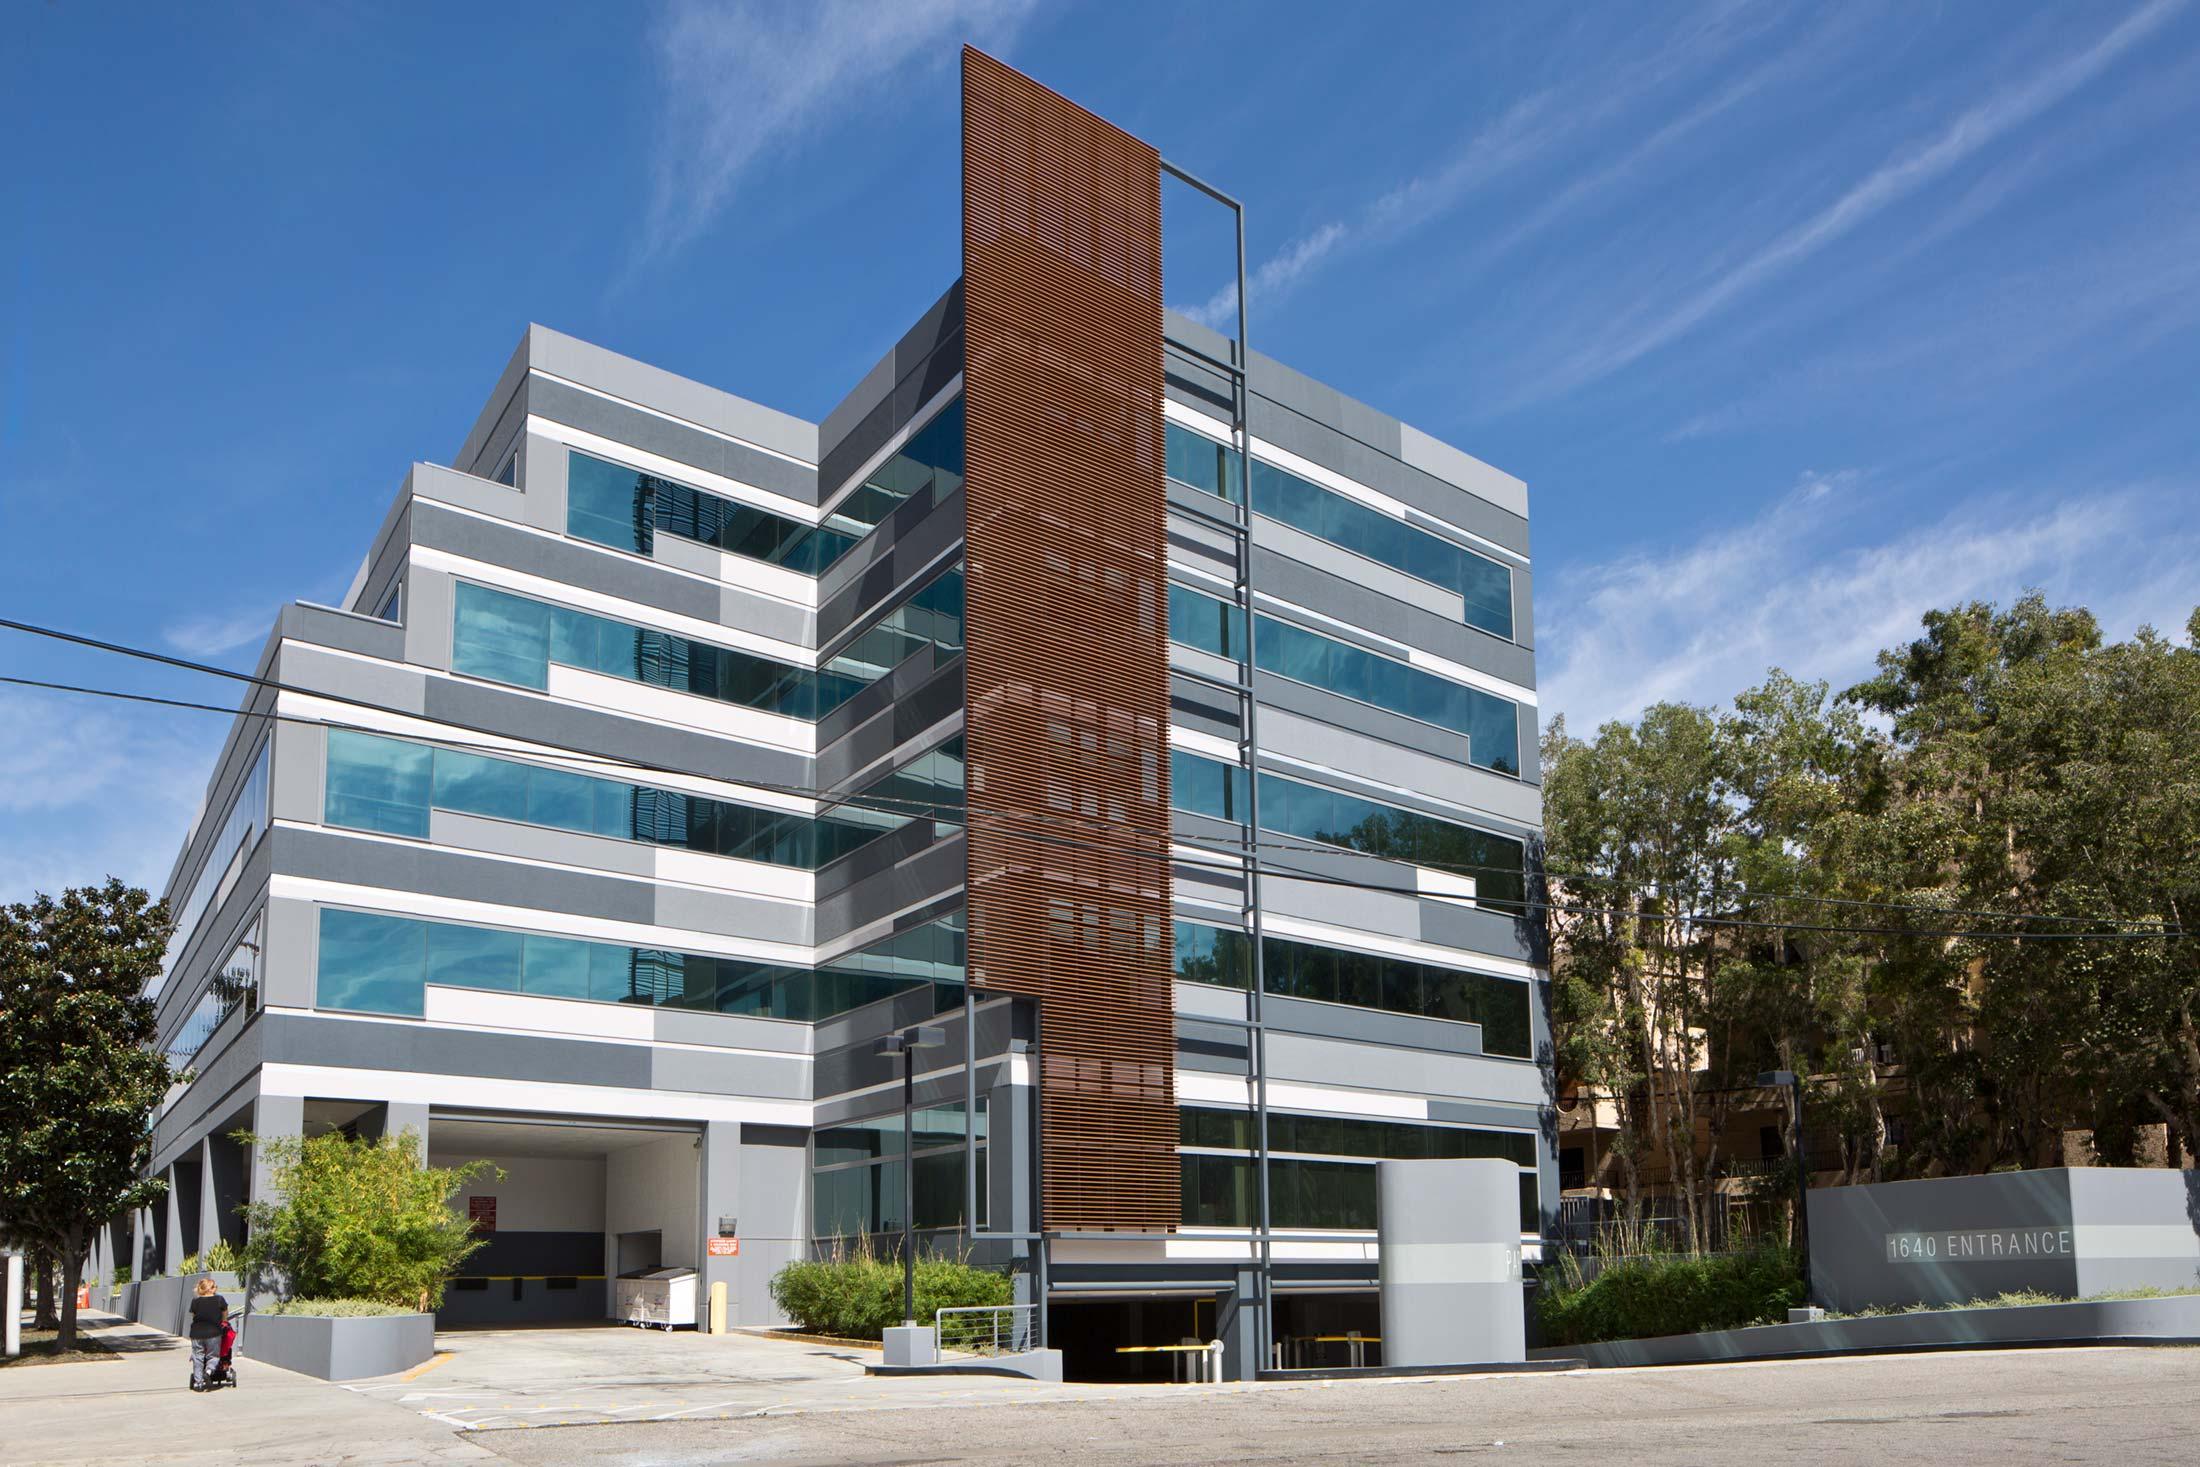 modern-architecture-building-commercial-shubindonaldson-1640-sepulveda-08